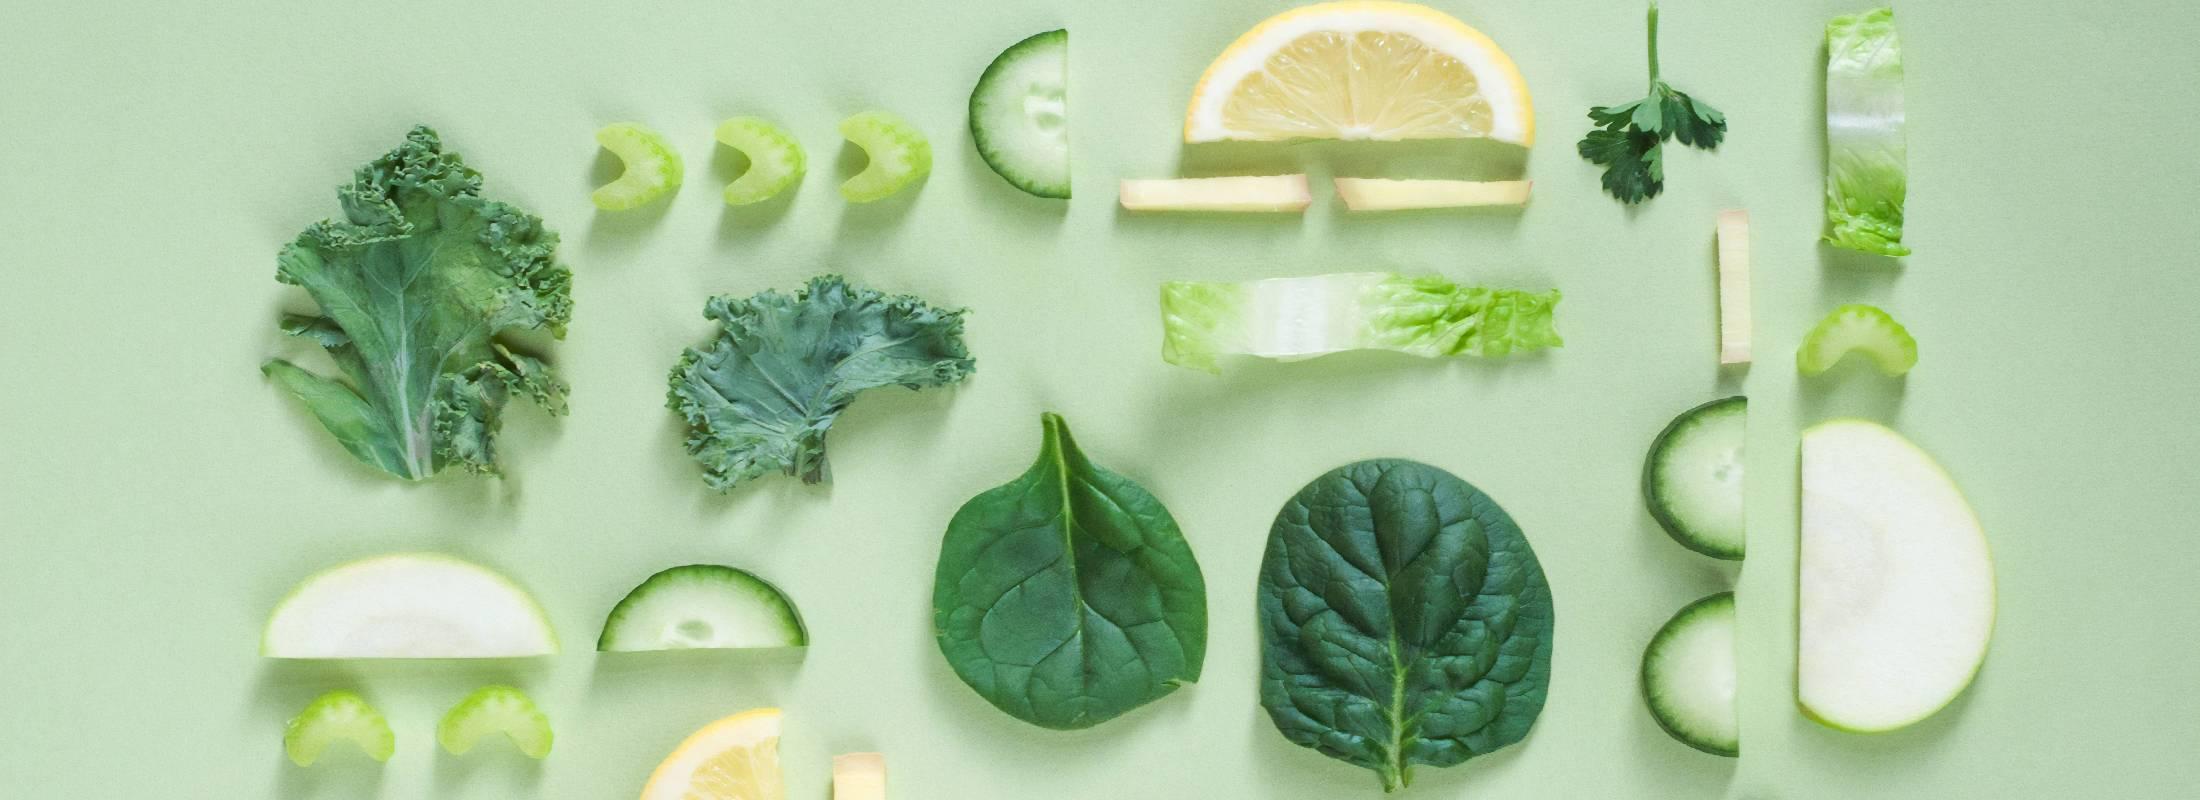 Comida para limpiar tu organismo